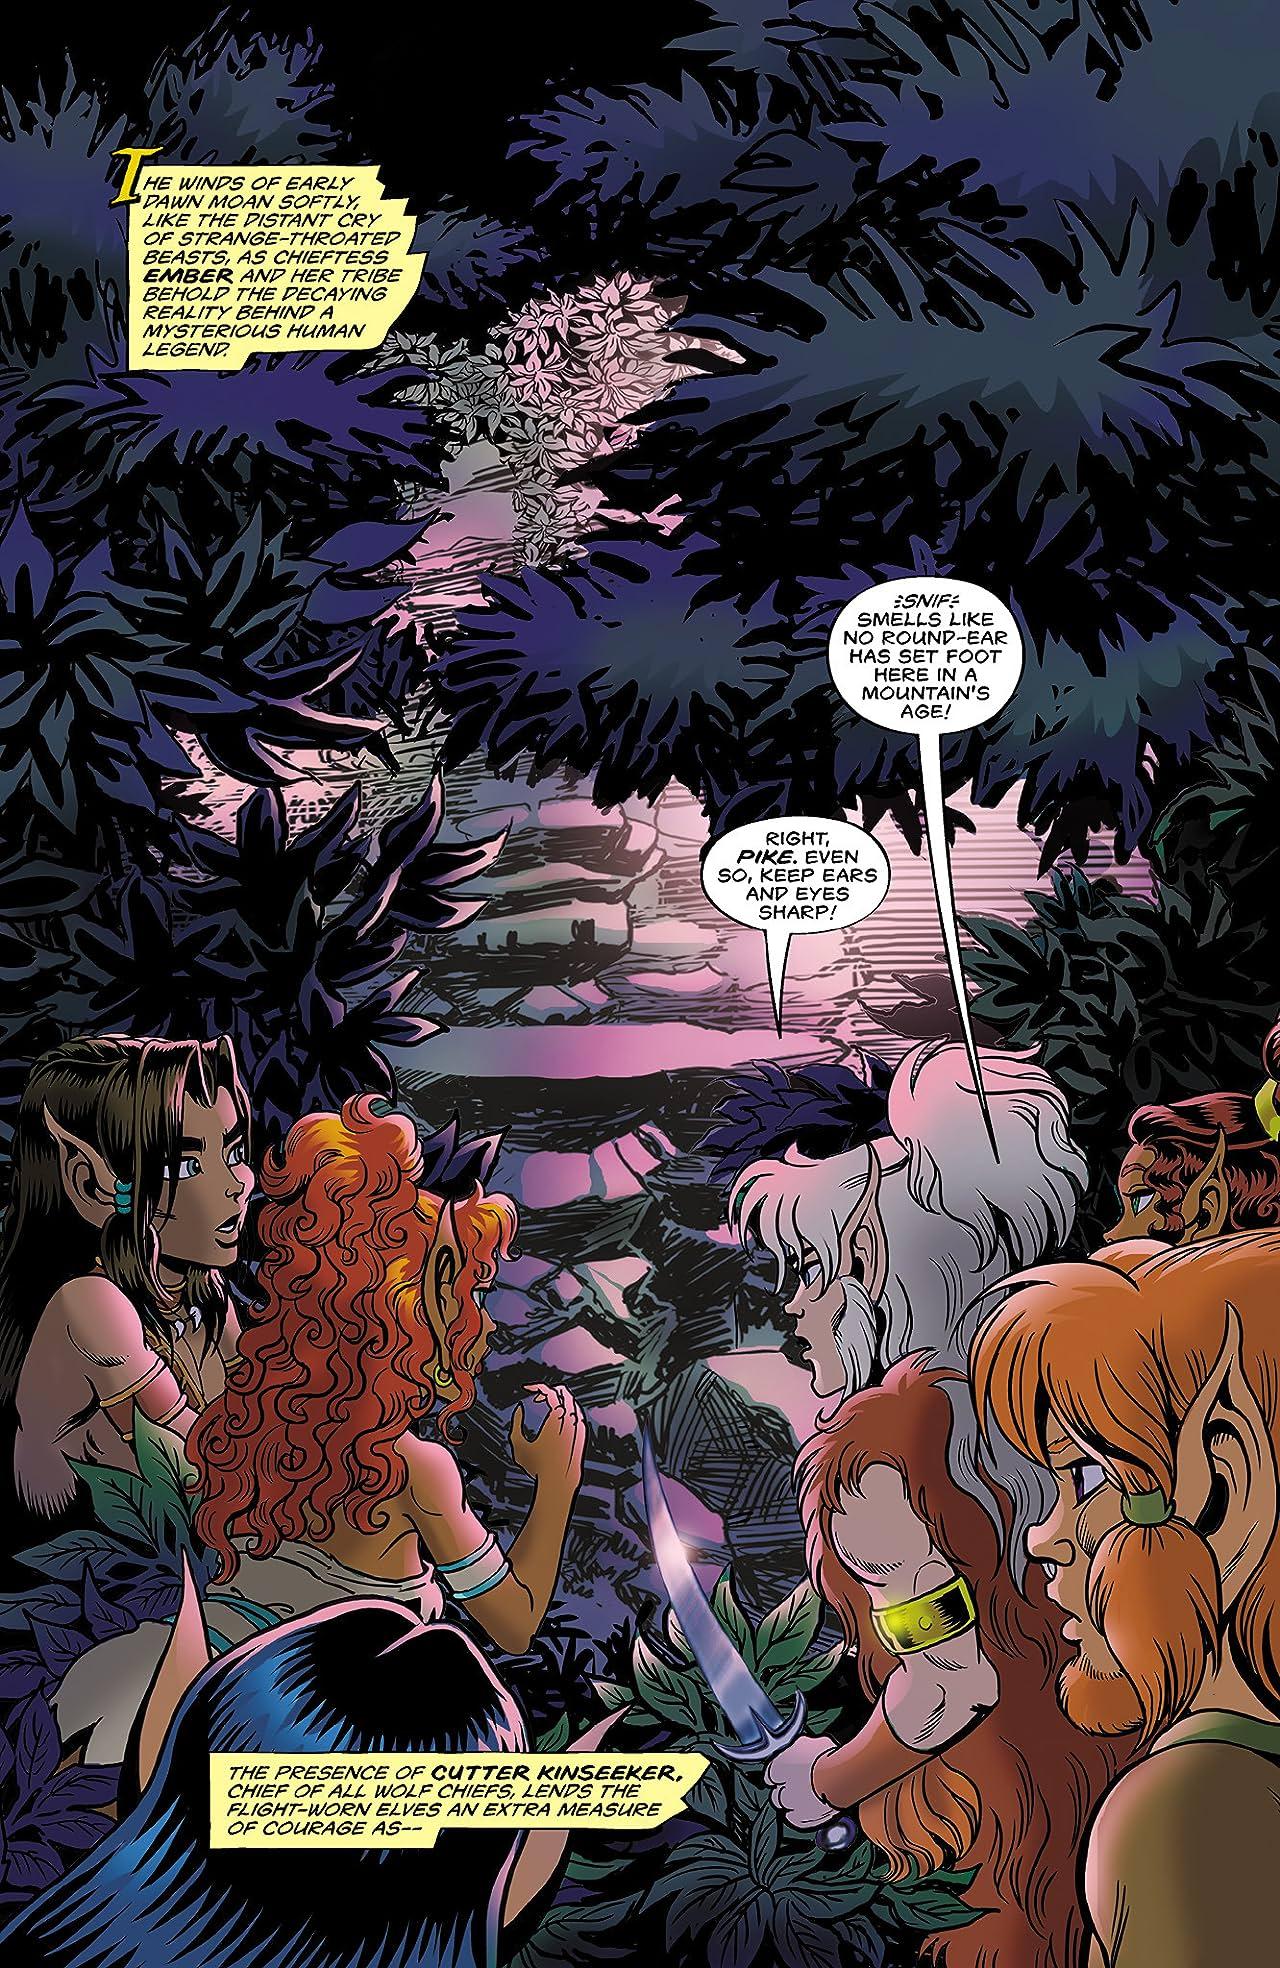 Elfquest: The Final Quest #6